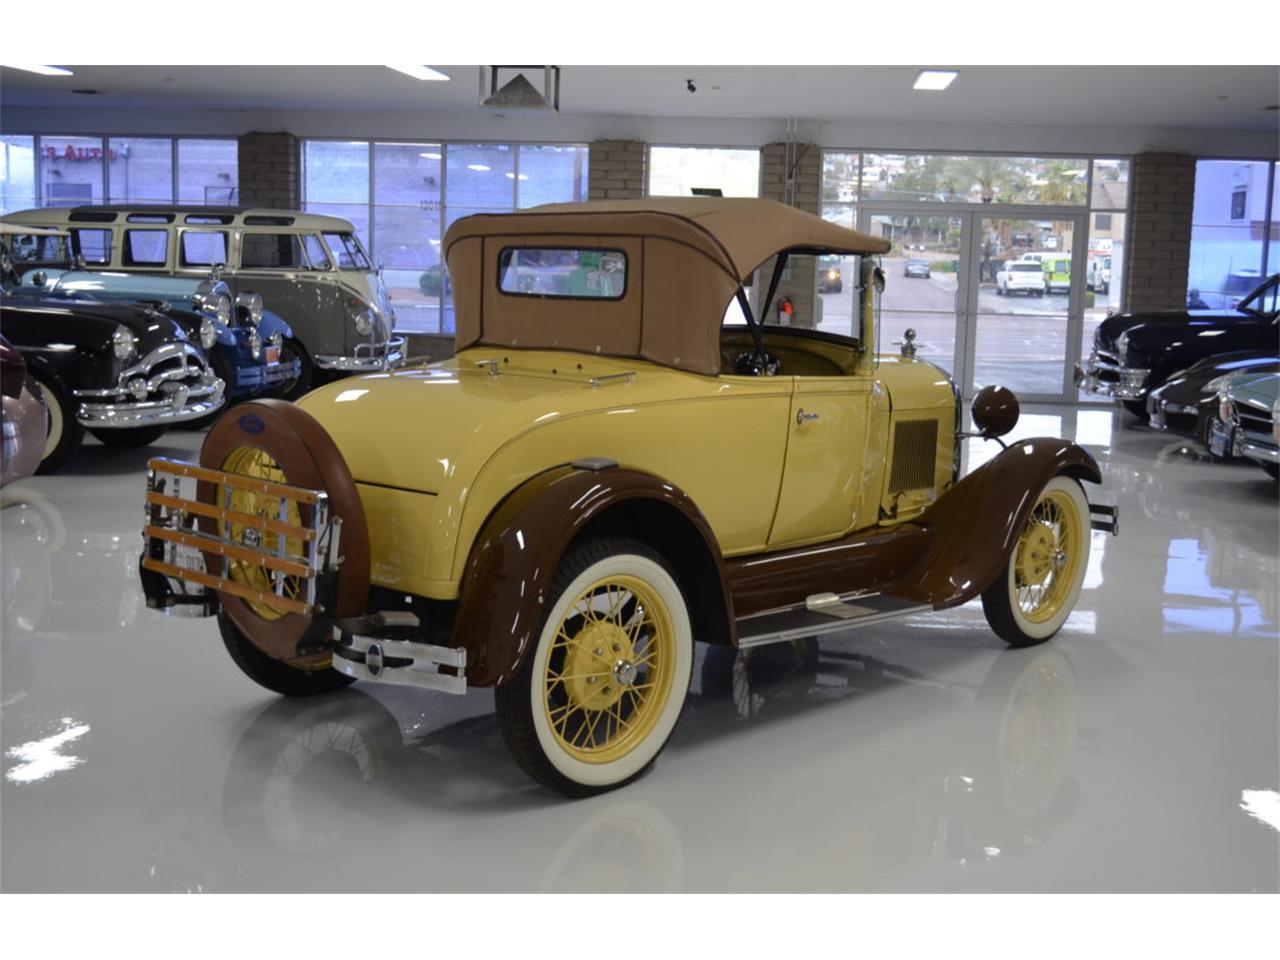 Ford Dealership Phoenix Az >> 1929 Ford Model A For Sale In Phoenix Az Classiccarsbay Com